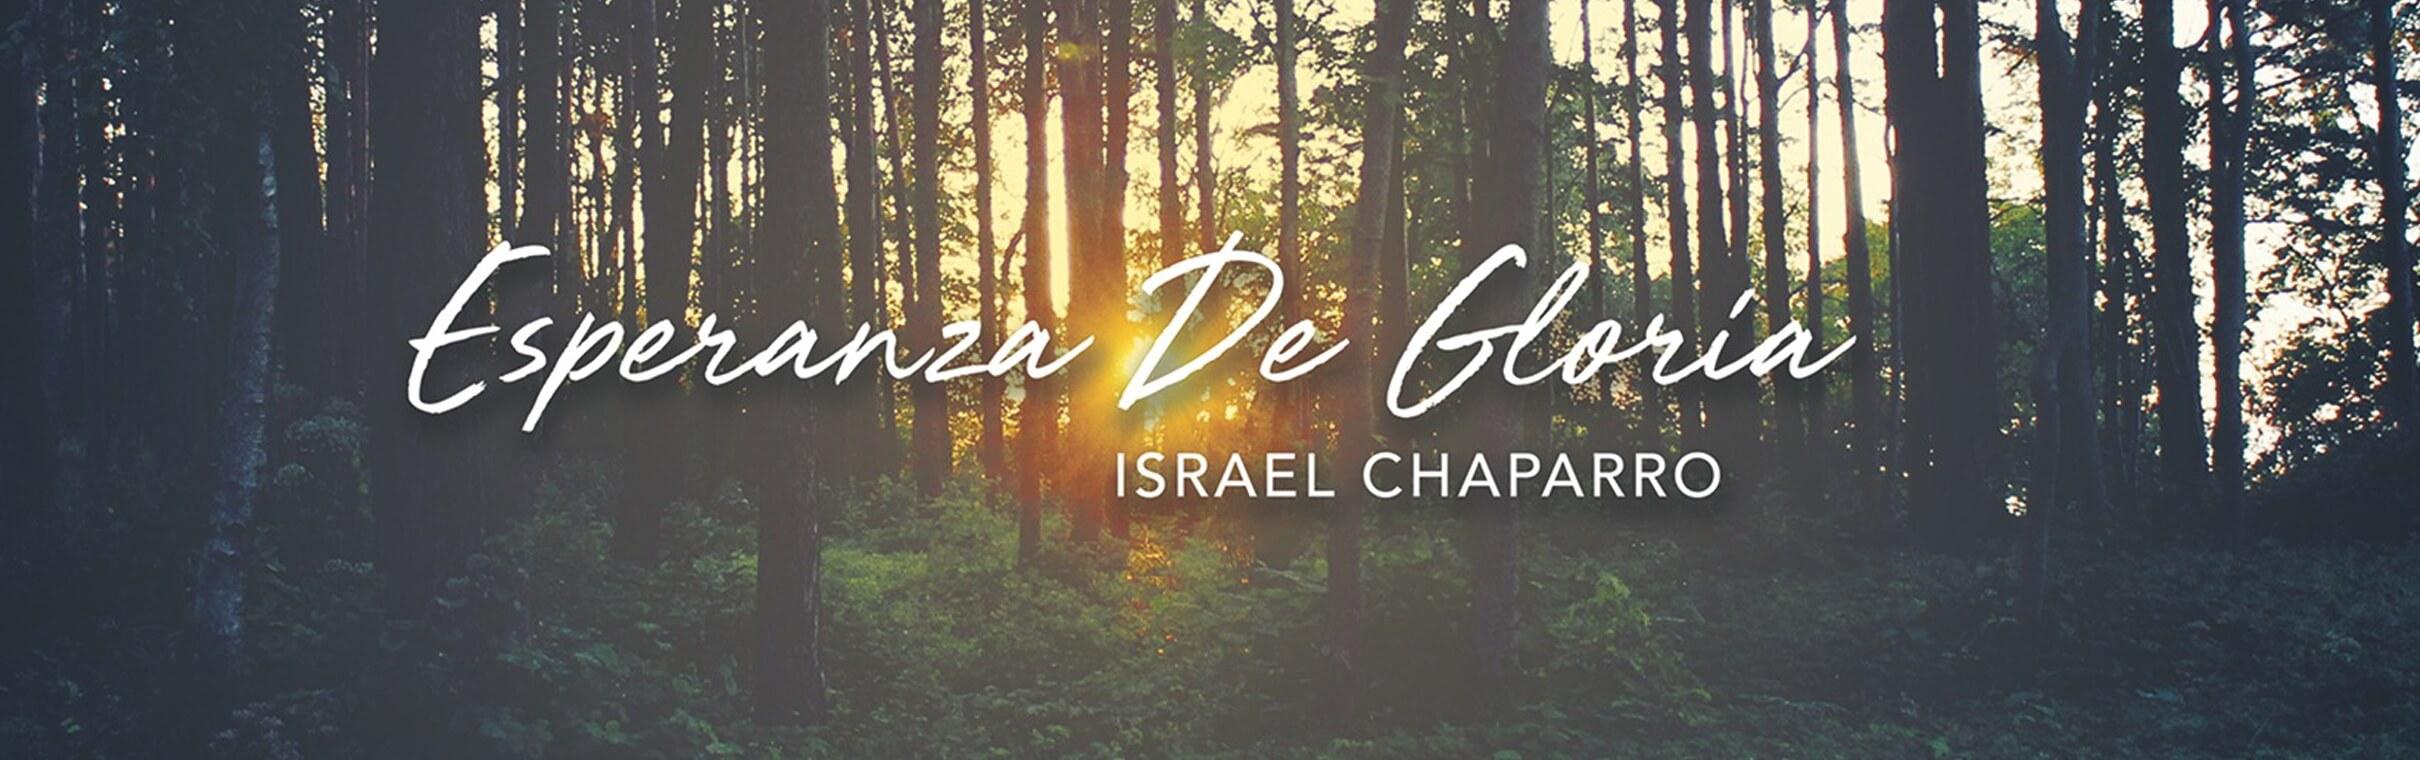 Israel Chaparro